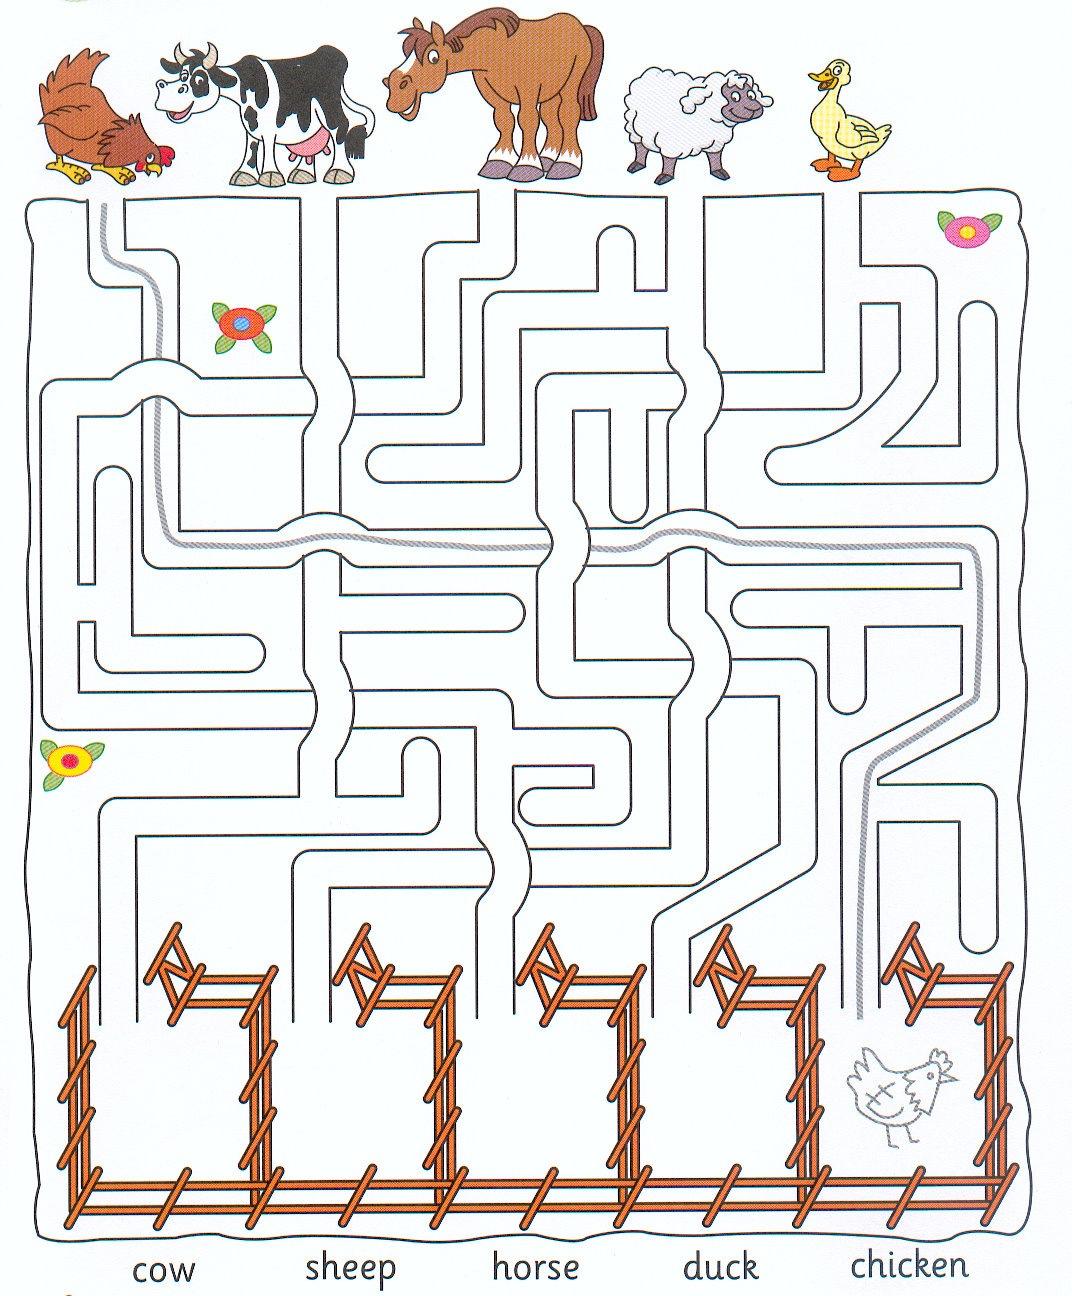 Bilingual Al Yussana Animals Maze